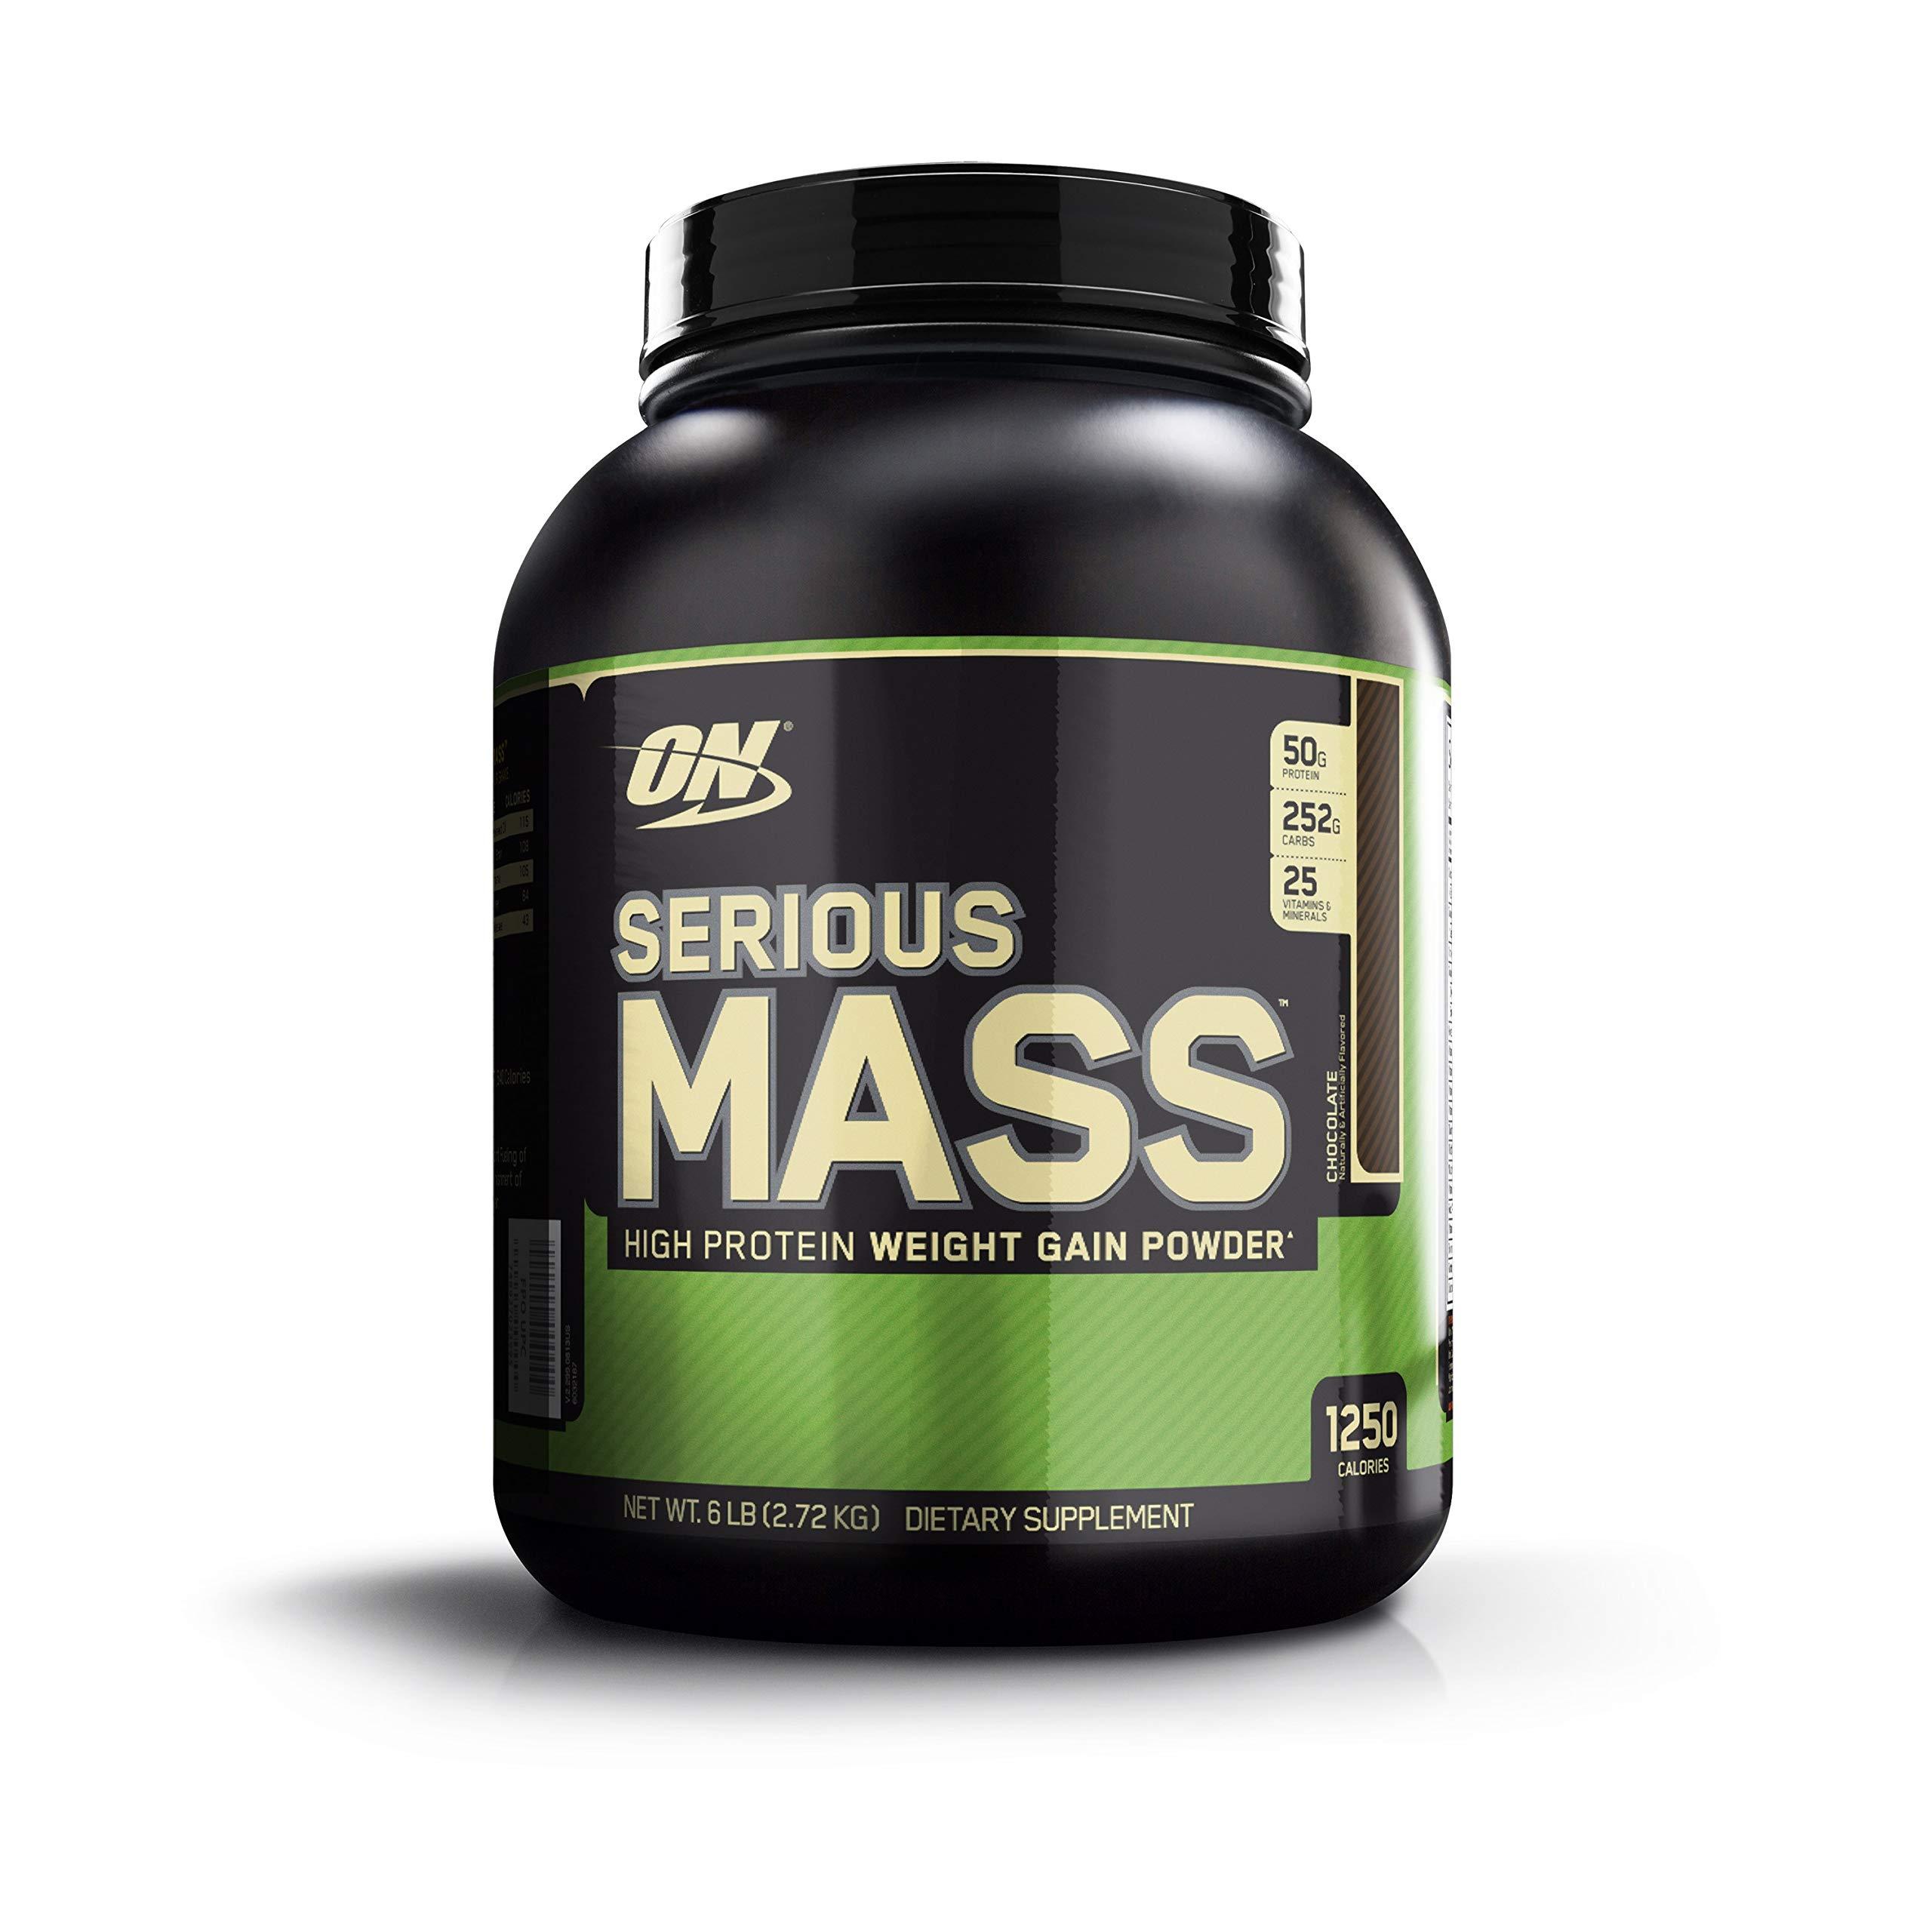 OPTIMUM NUTRITION Serious Mass Weight Gainer Protein Powder, Chocolate, 6 Pound by Optimum Nutrition